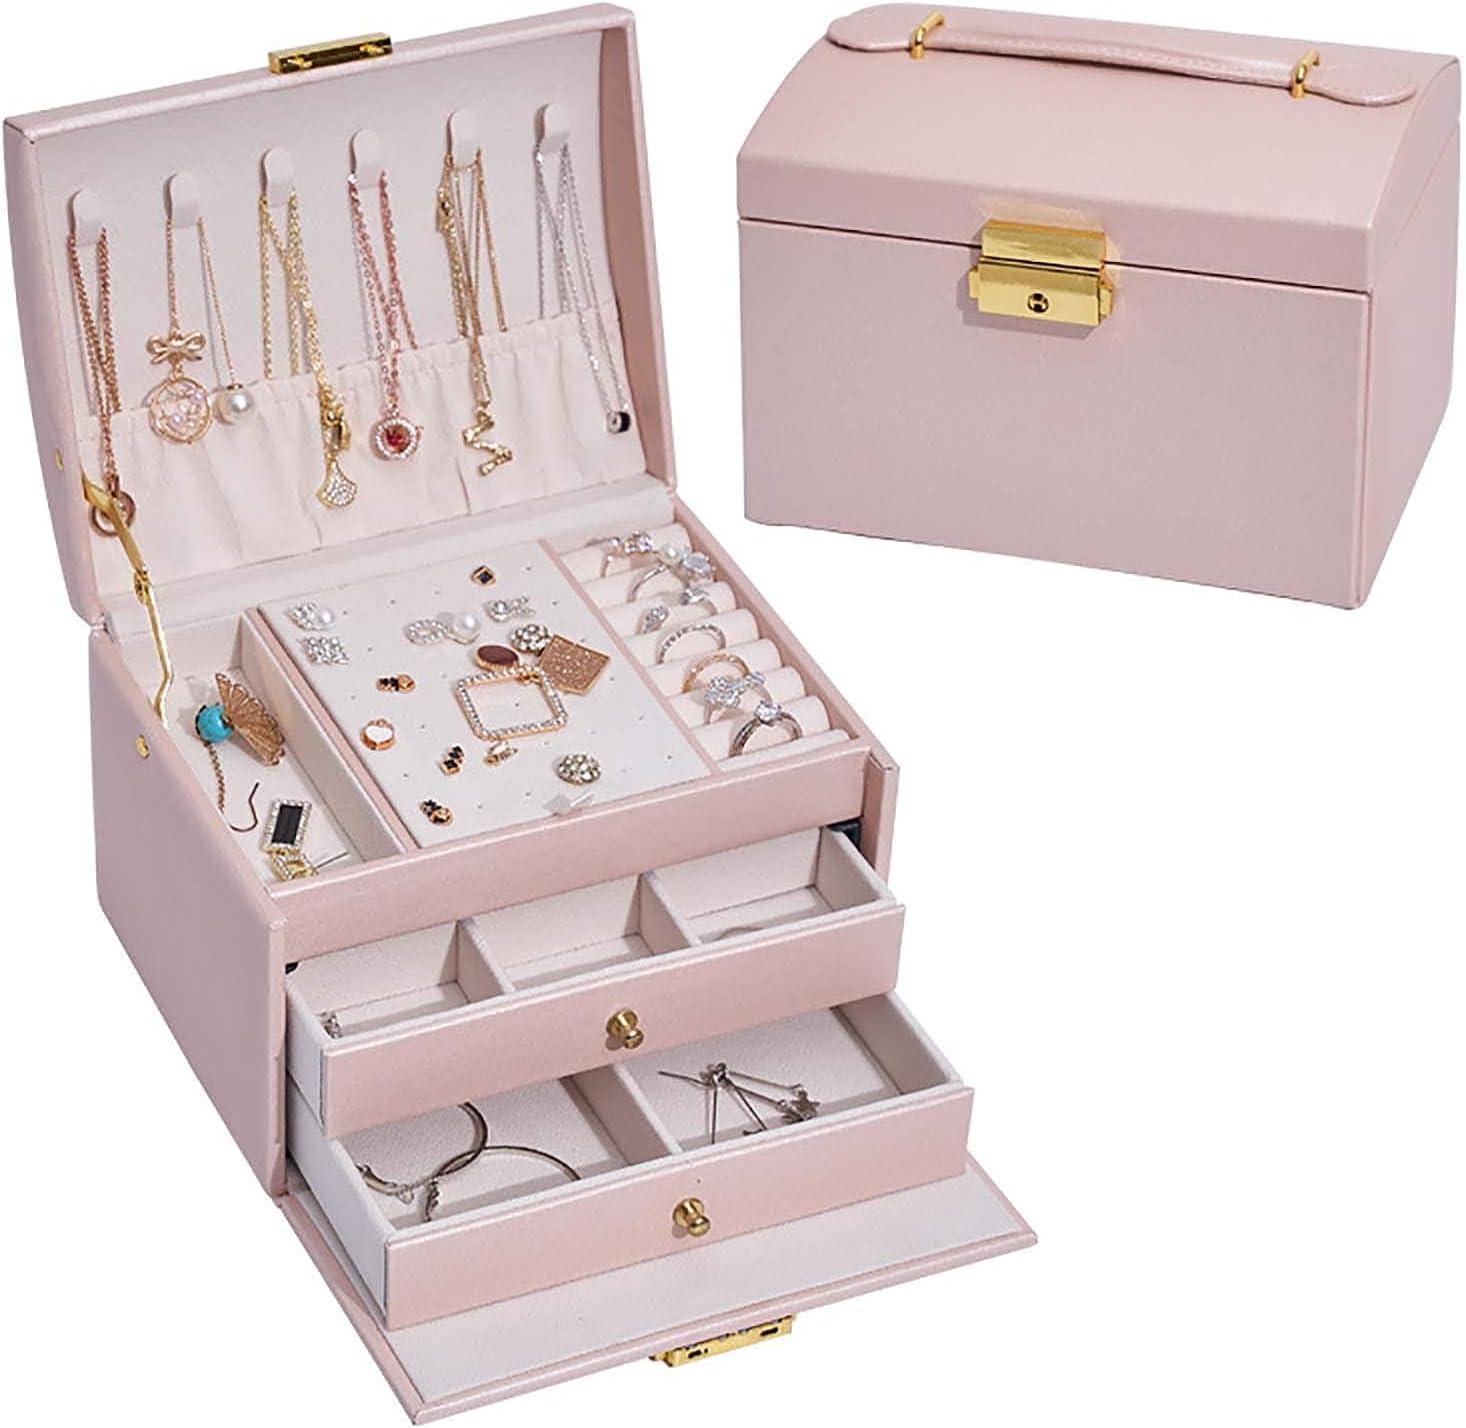 quality assurance erddcbb Jewellery Box Organiser 2 Spasm price Three with Drawers